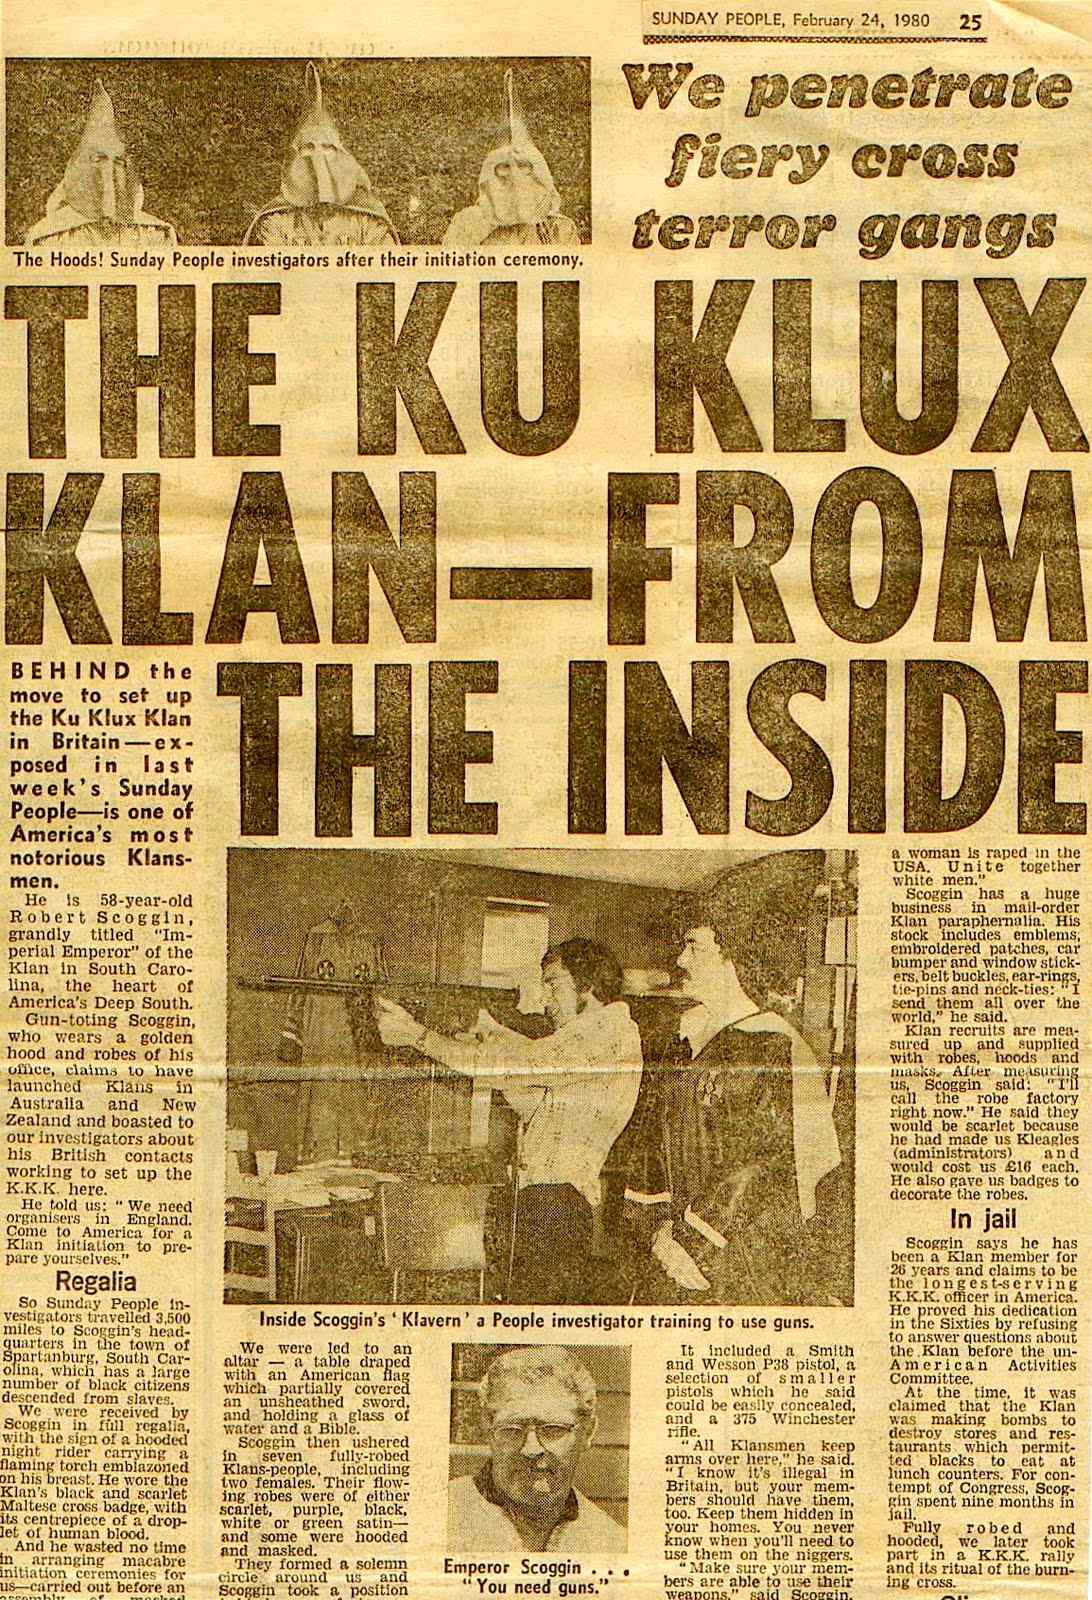 KKK NEWSPAPER EDITORS,KKK REPORTERS,NEWSPAPER EDITORS WHO ...